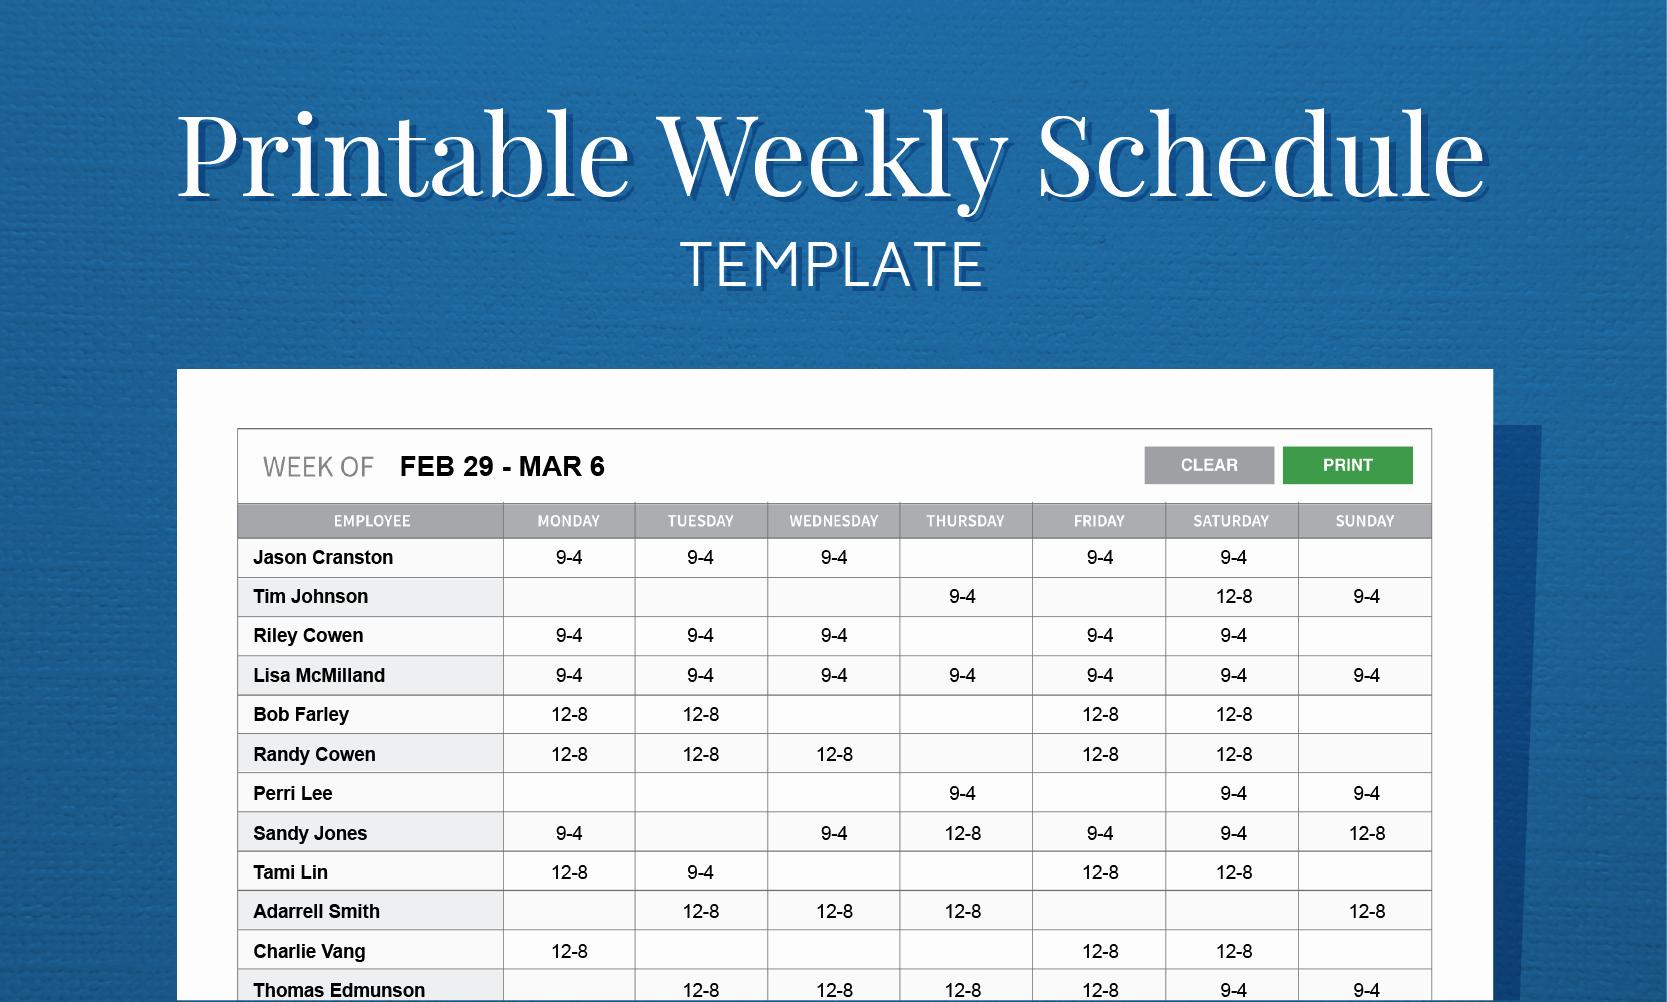 Week Work Schedule Template Fresh Free Printable Weekly Work Schedule Template for Employee